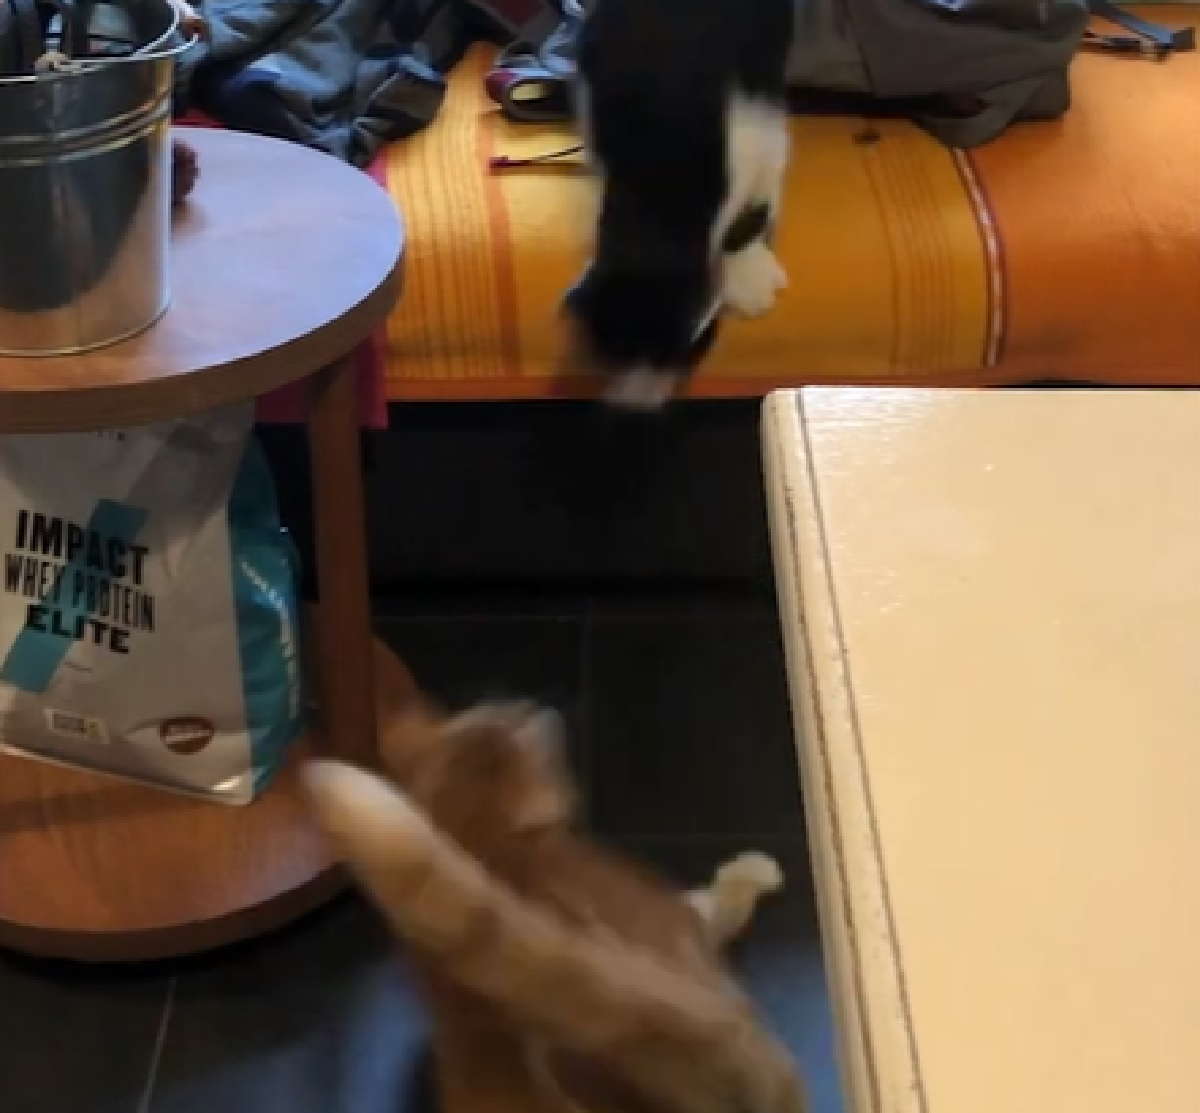 findus pattersson gattini mamma registra